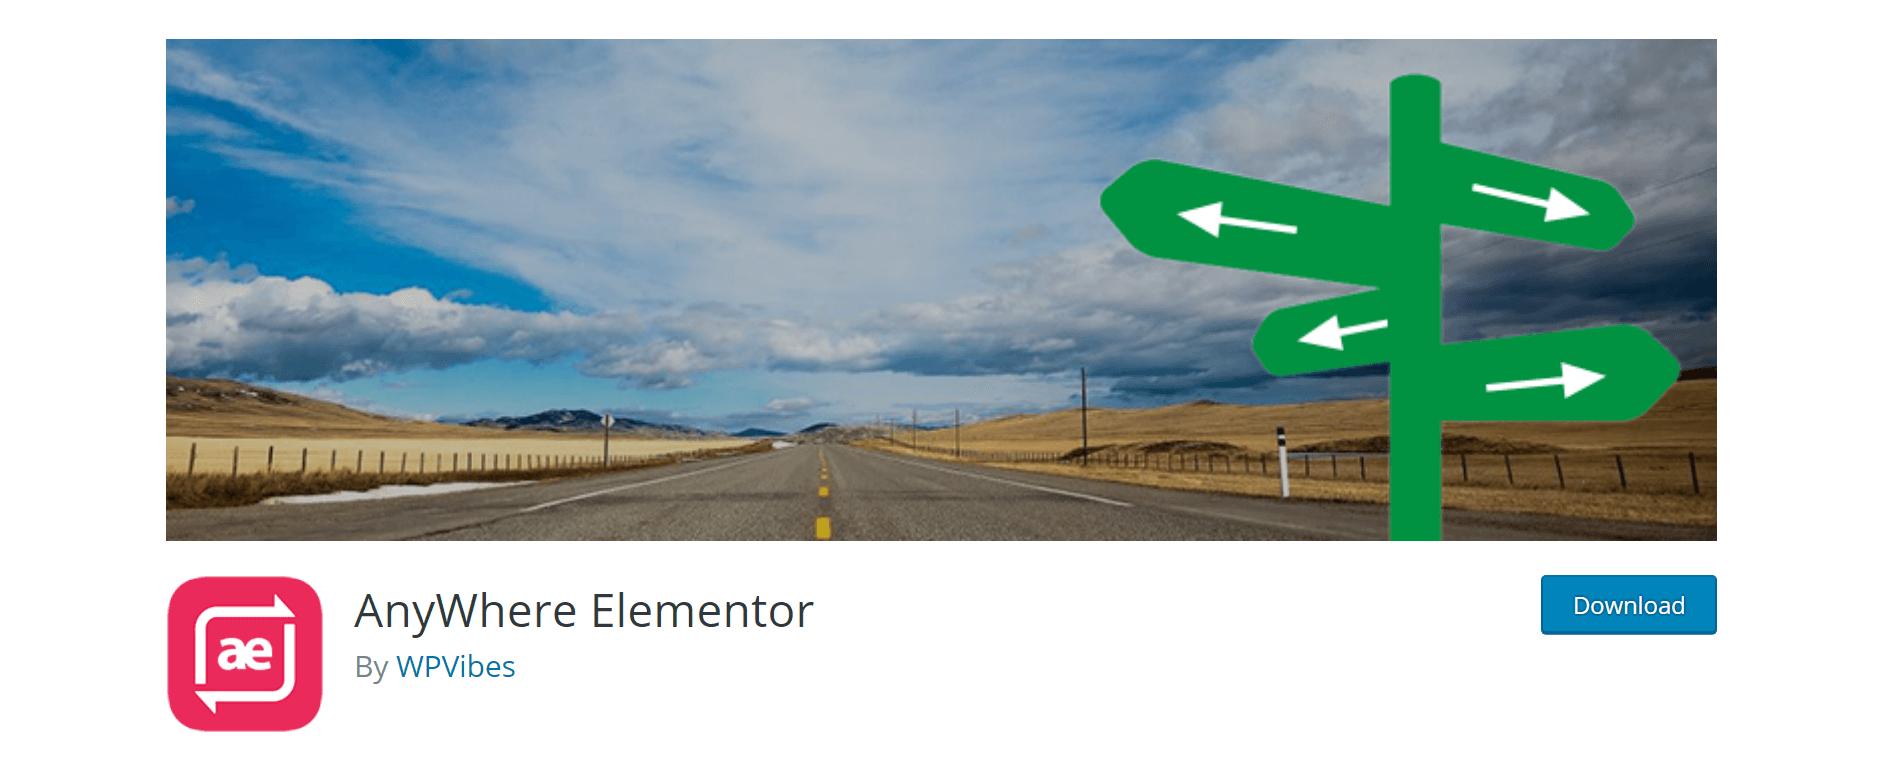 Elementor教學:一篇讓你認識Elementor,從主題推薦+附加外掛+主機推薦+後續Q&A 6